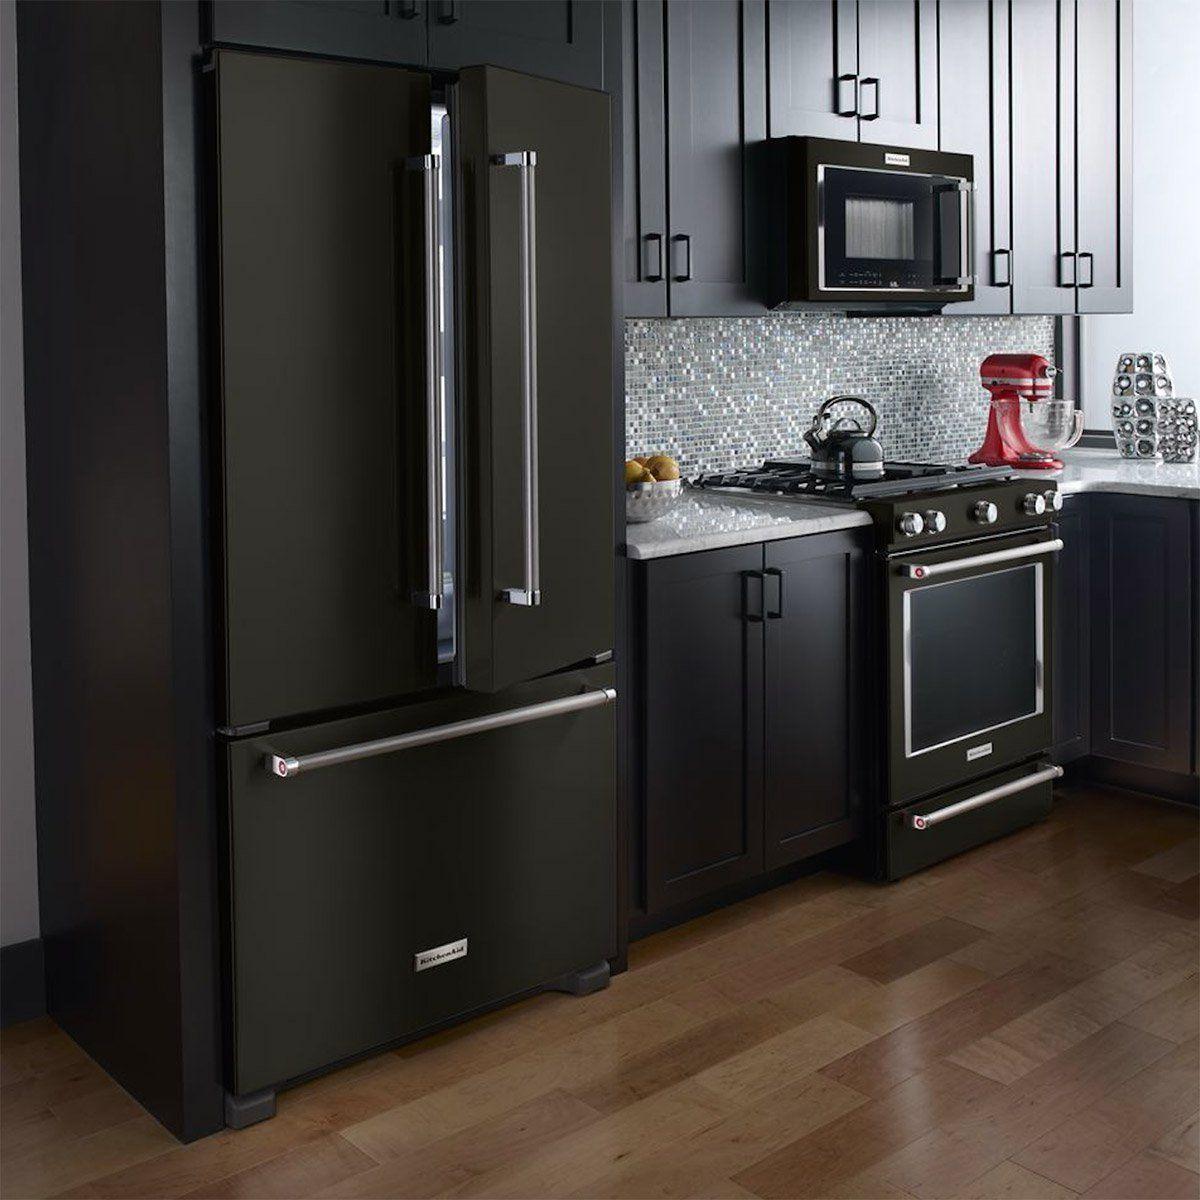 New Today Home Trend Black Stainless Steel Appliances Metrogaragedoor Com Black Appliances Kitchen White Kitchen Remodeling Kitchen Remodel Small Appliances in the kitchen